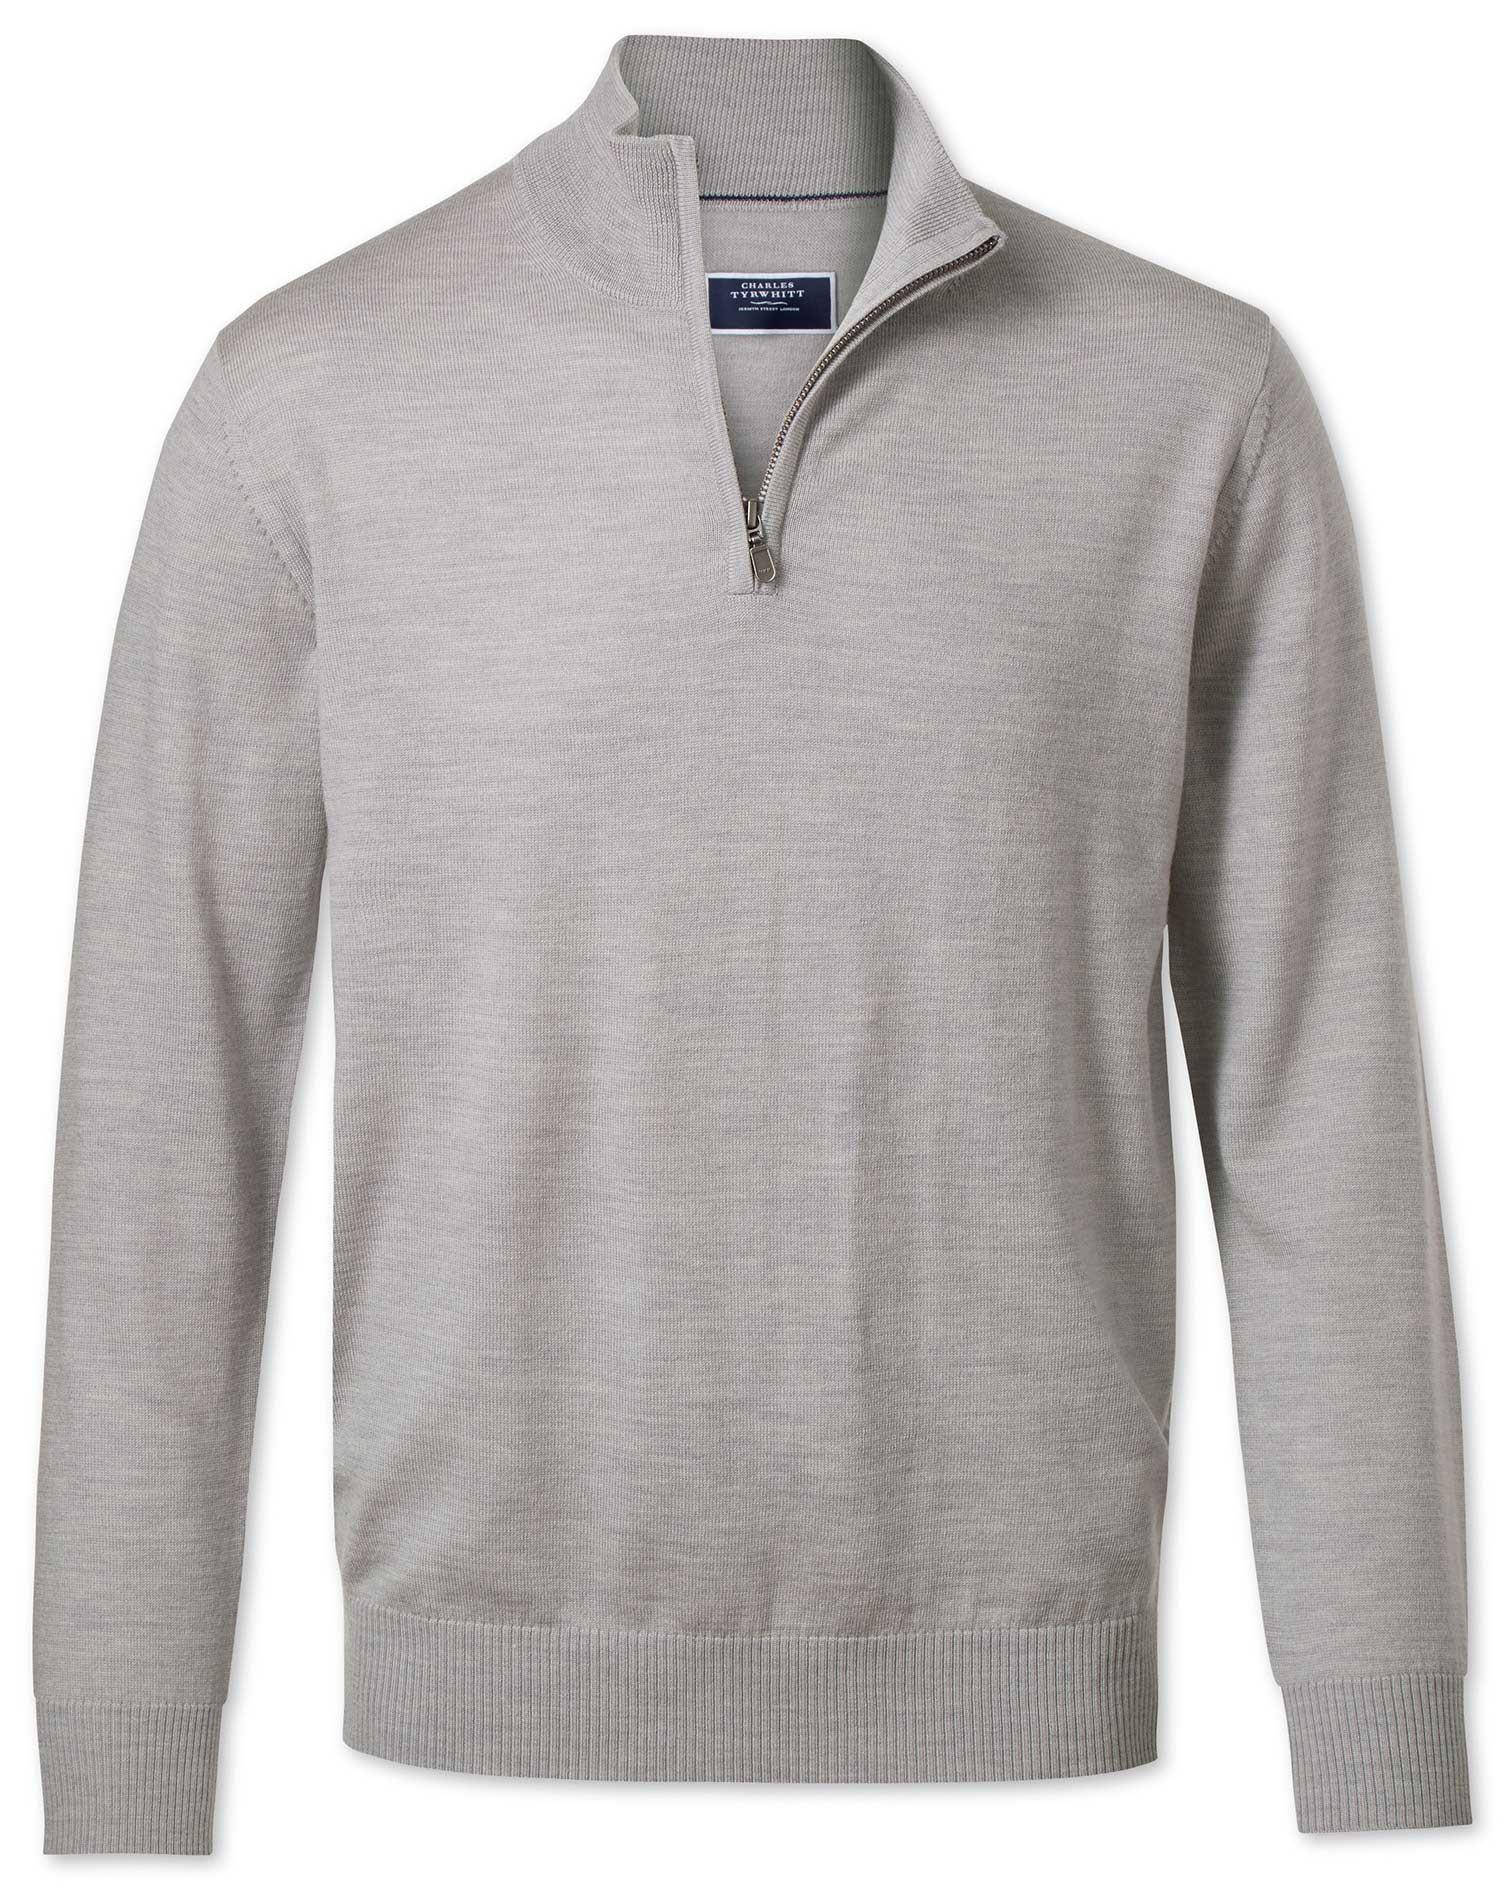 Silver Zip Neck Merino Wool Jumper Size Large by Charles Tyrwhitt